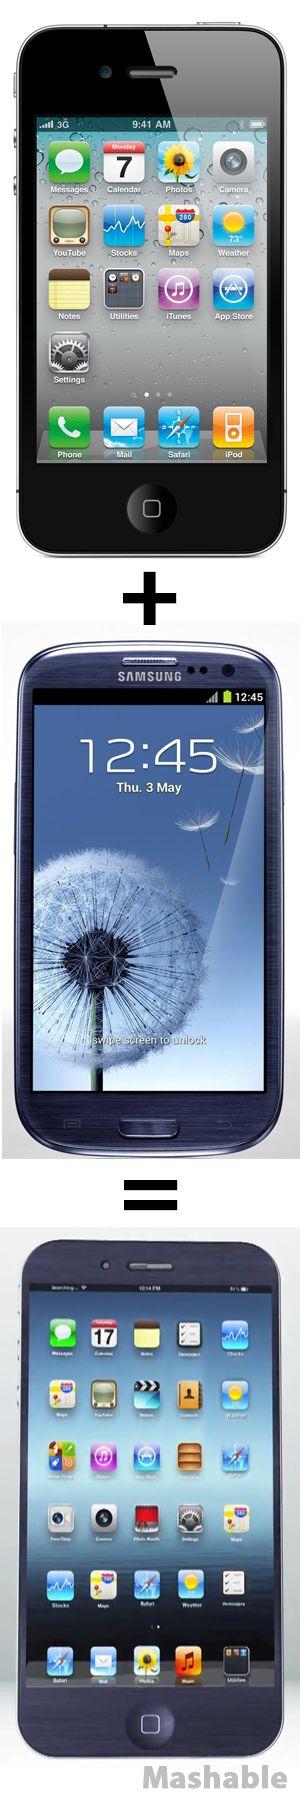 iPhone 4S + Samsung Galaxy S III = iSung Galaxy V  //  SEE THE CONCEPT